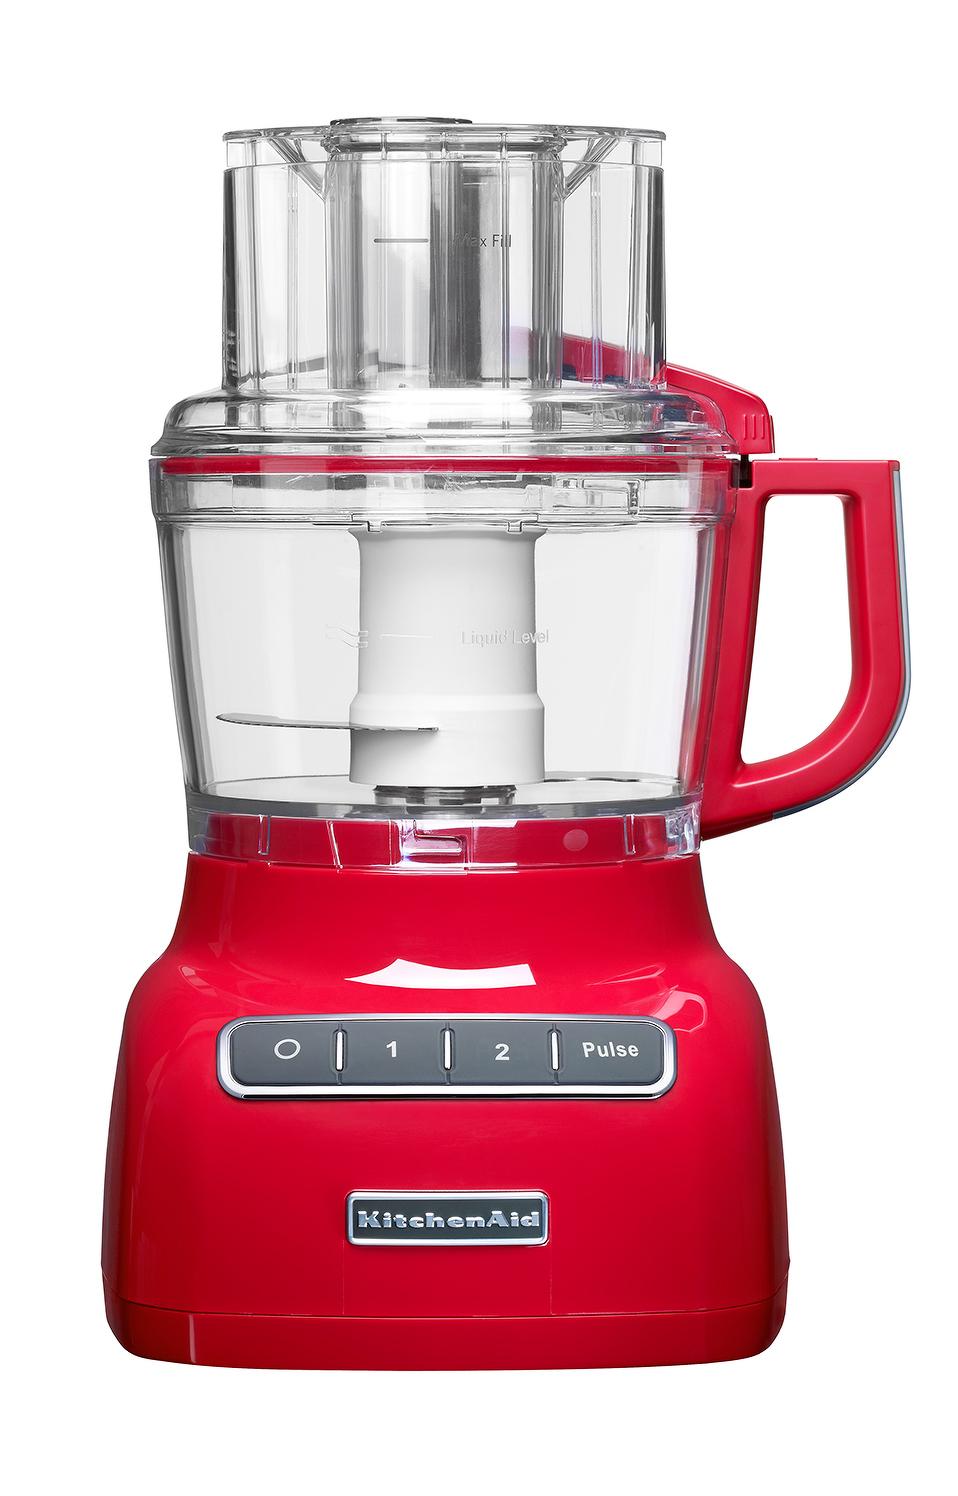 KitchenAid Food processor 5KFP0925EER královská červená